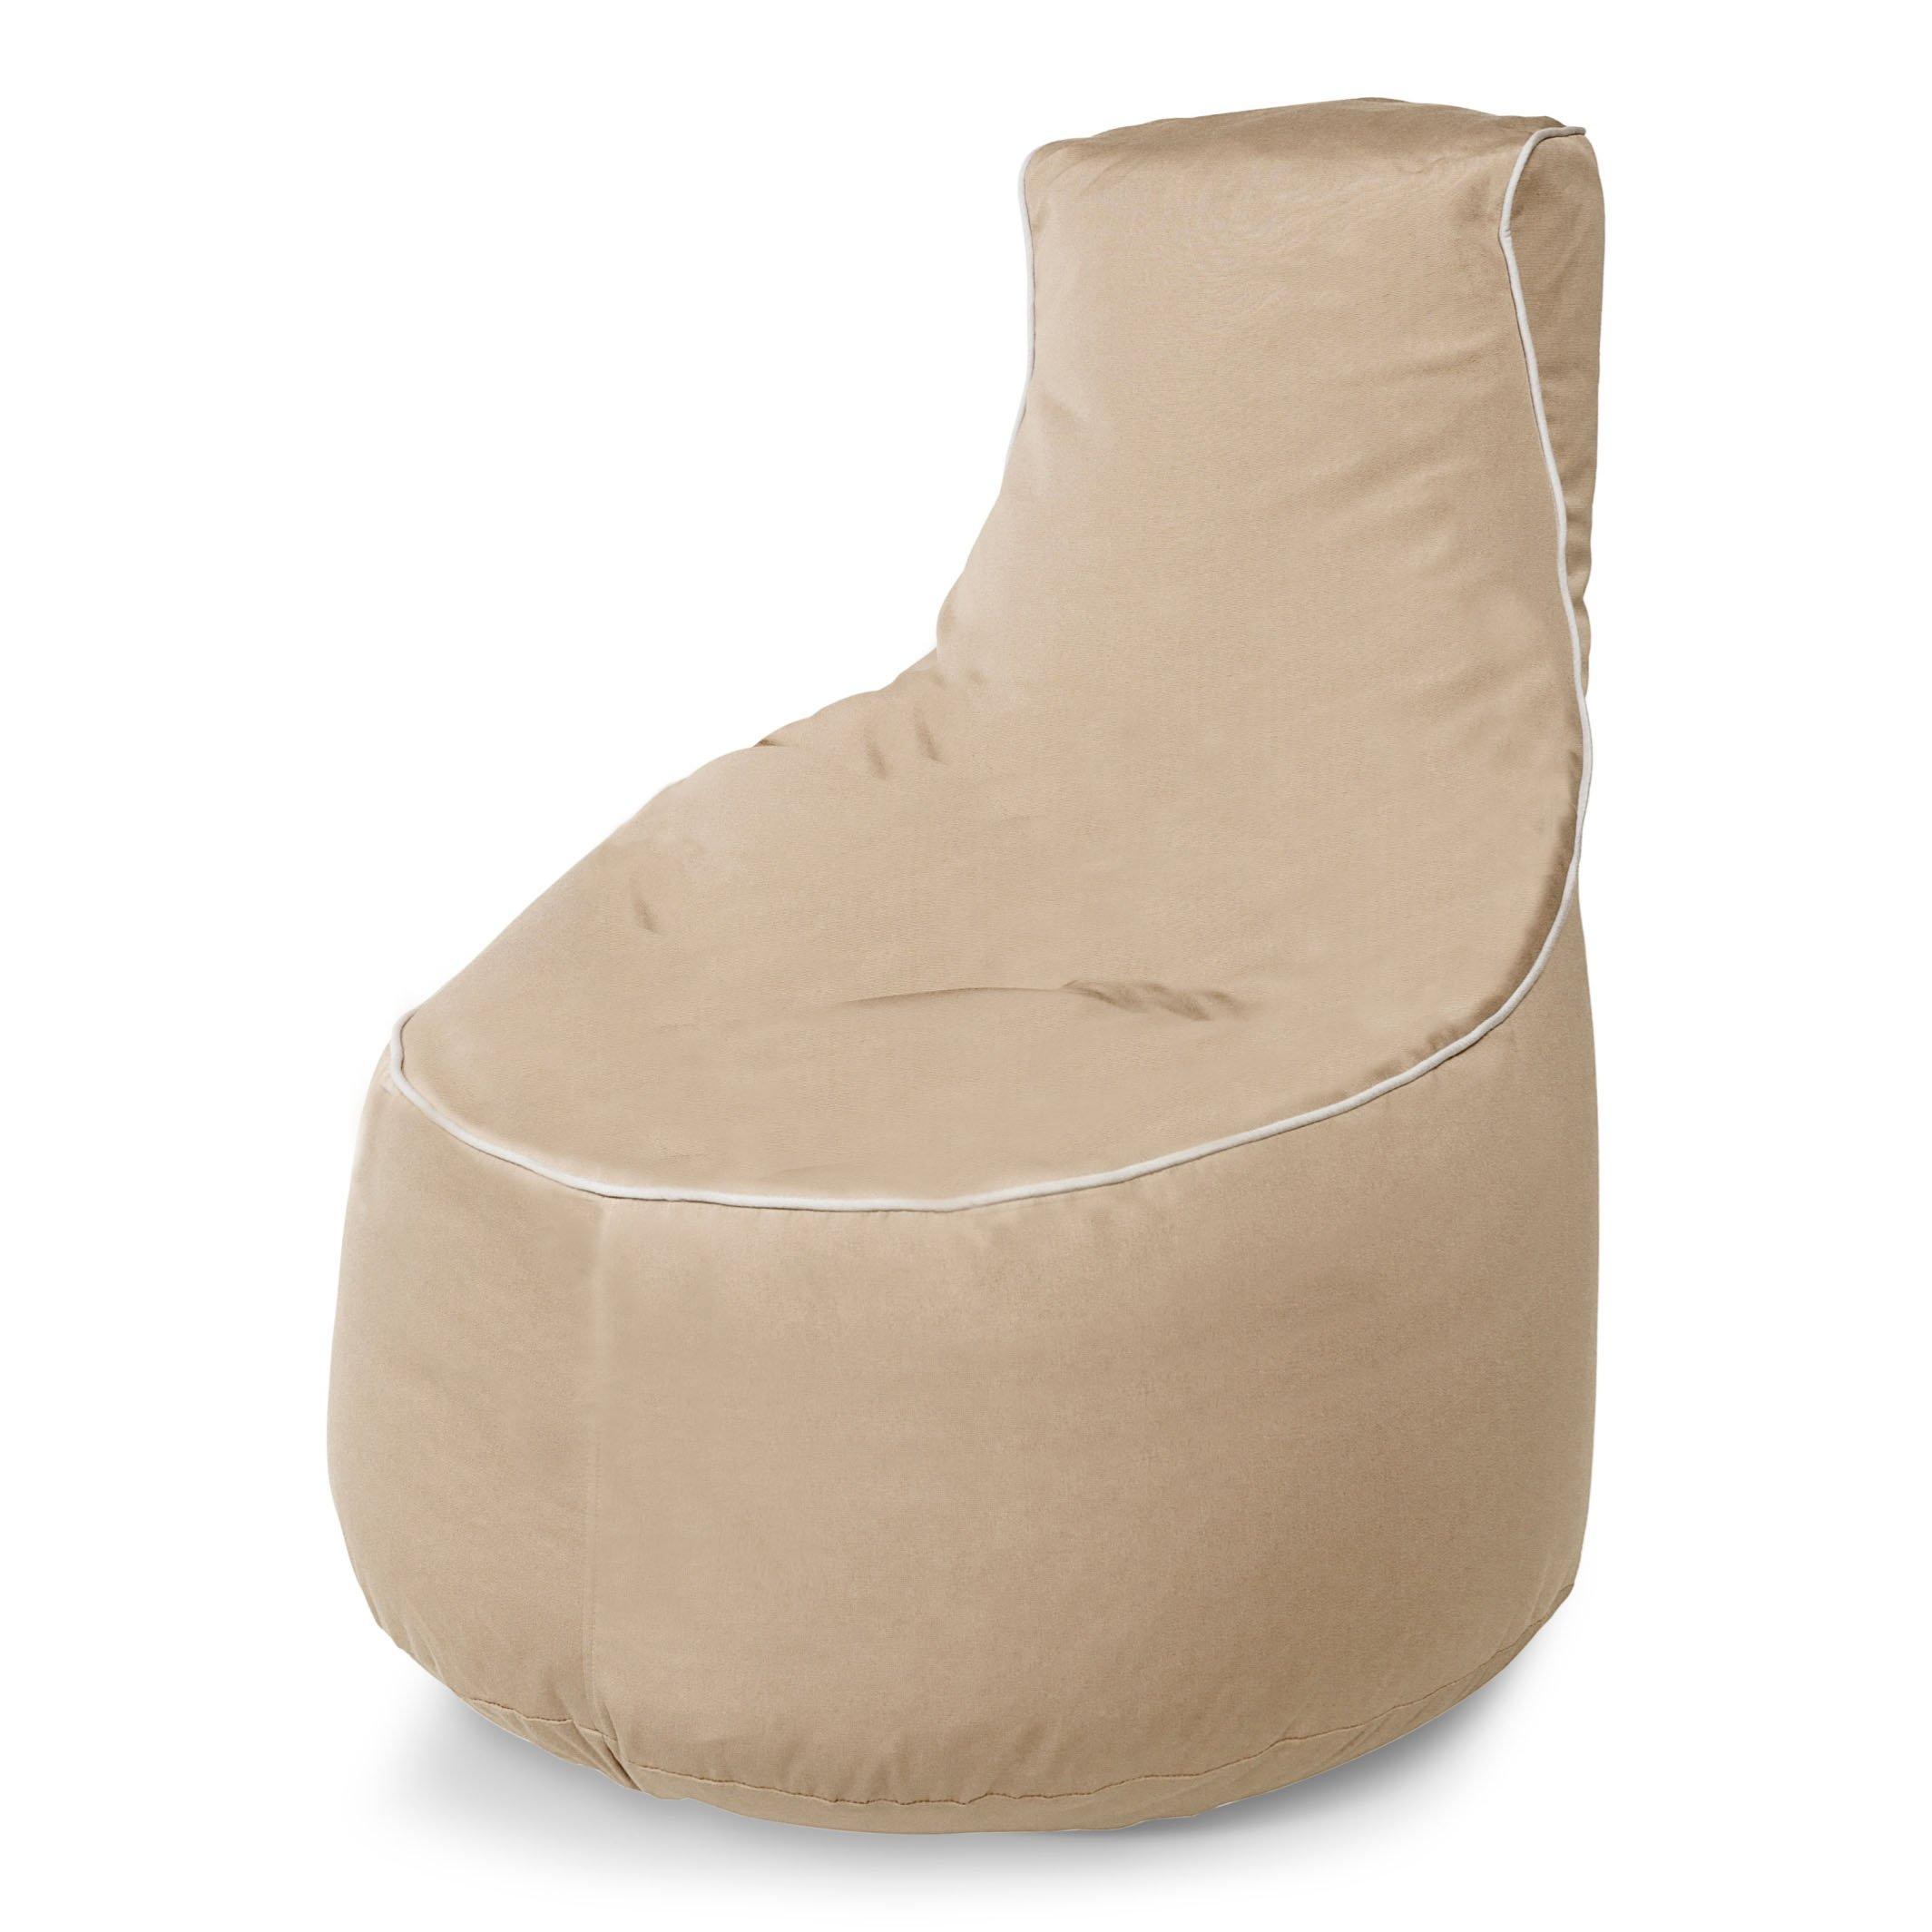 Sunbrella Upright Bean Bag Chair with Lumbar Support